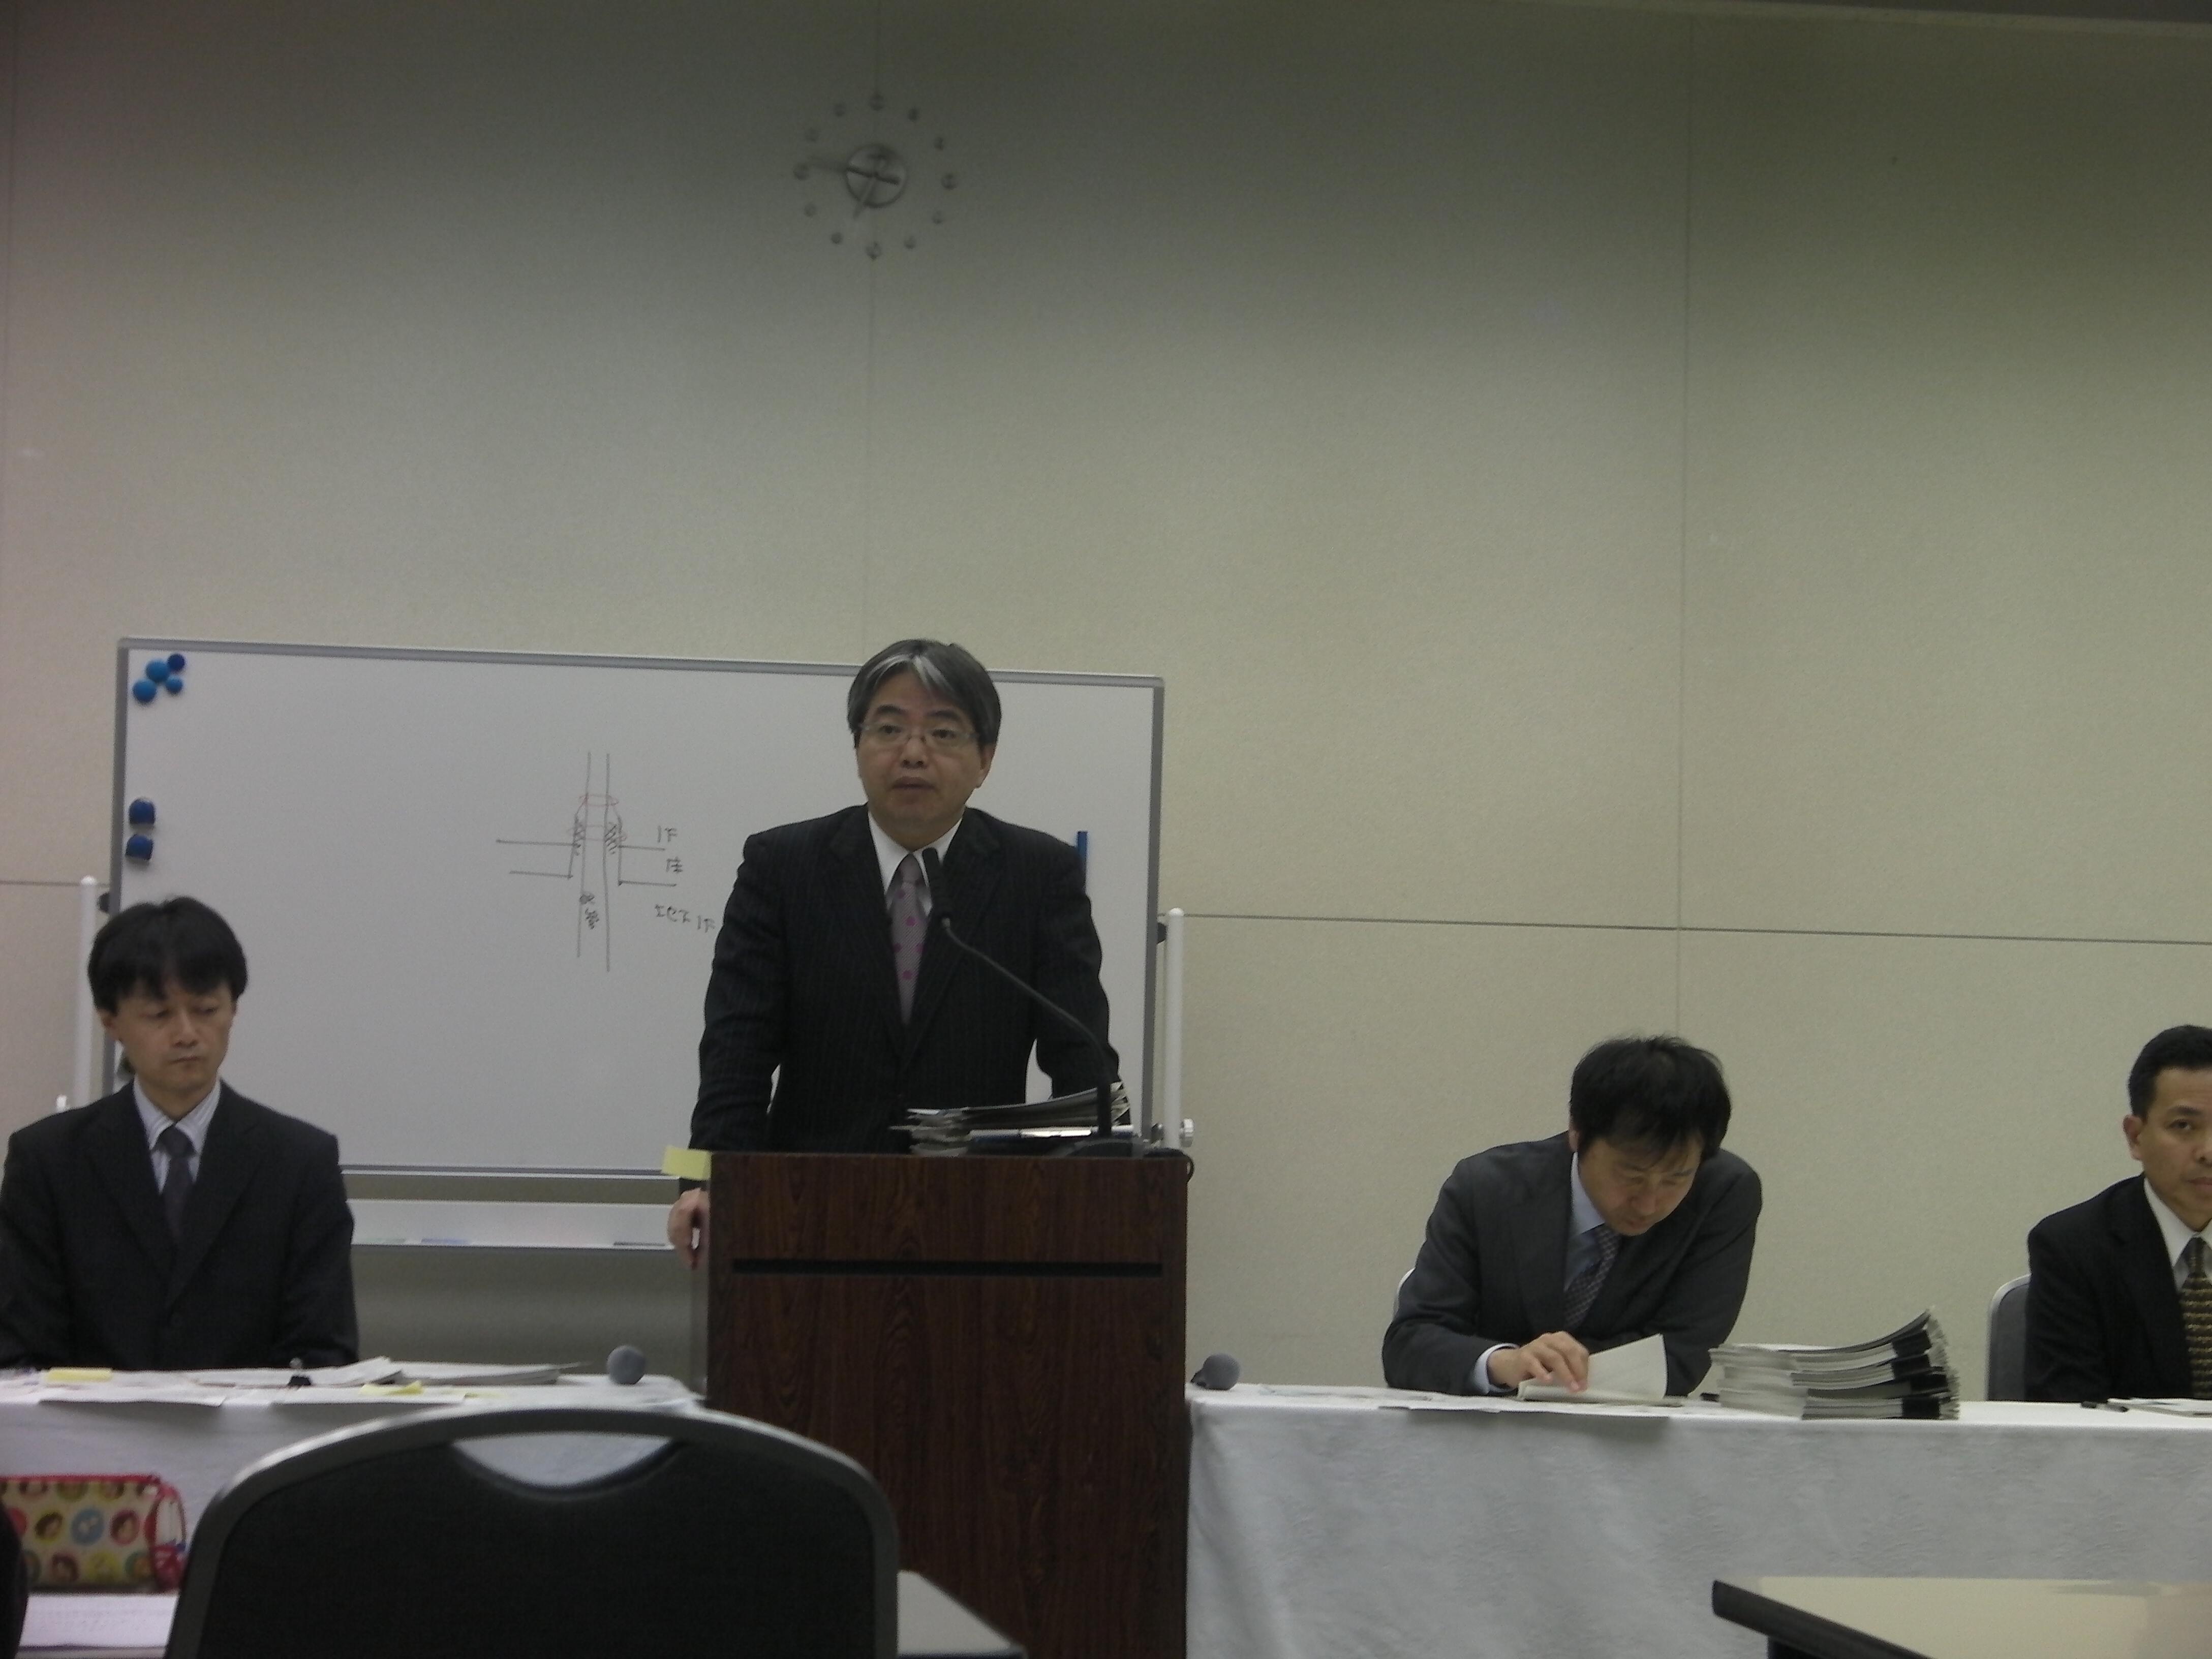 http://daily.magazine9.jp/m9/oshidori/SANY0141.JPG